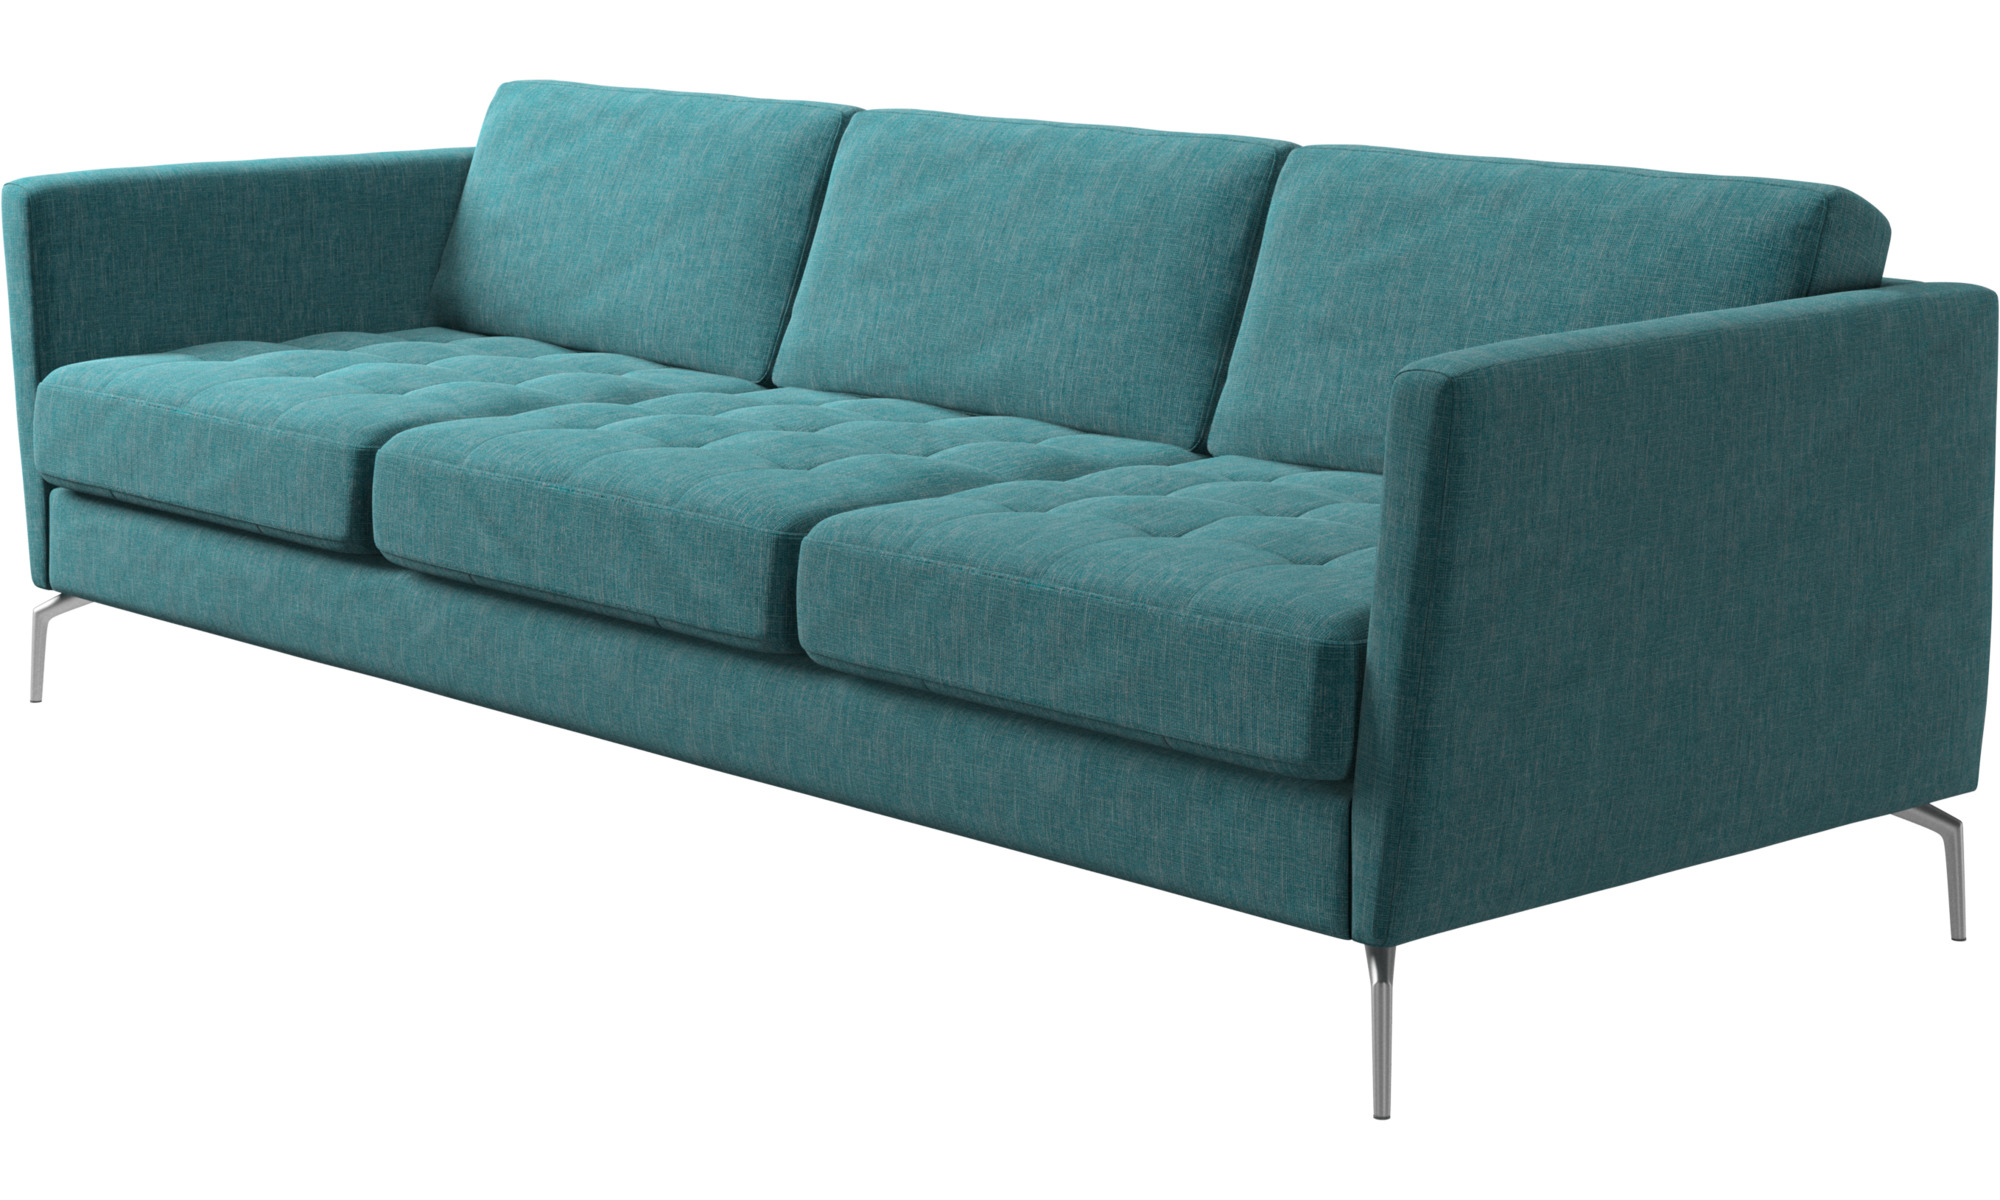 3 sitzer sofas osaka sofa getuftete sitzfl che boconcept. Black Bedroom Furniture Sets. Home Design Ideas